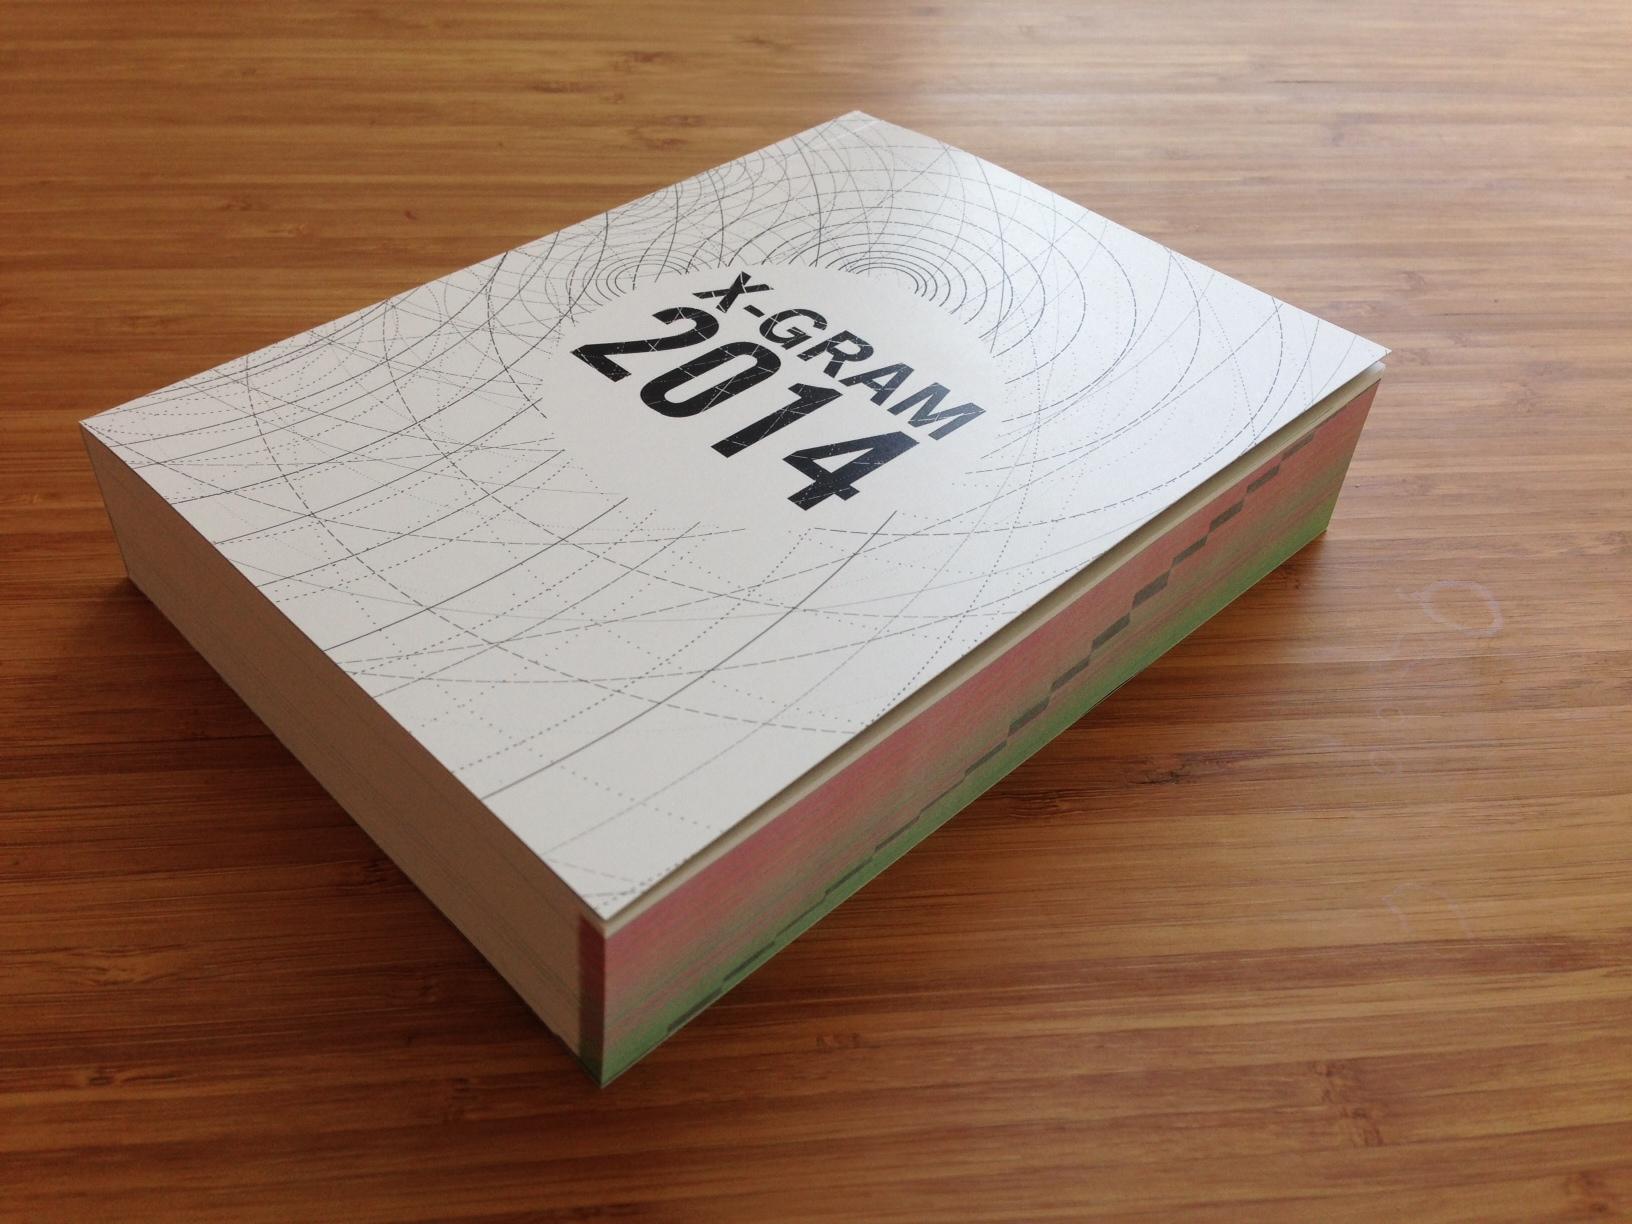 2014 X-GRAM, organized chronologically.